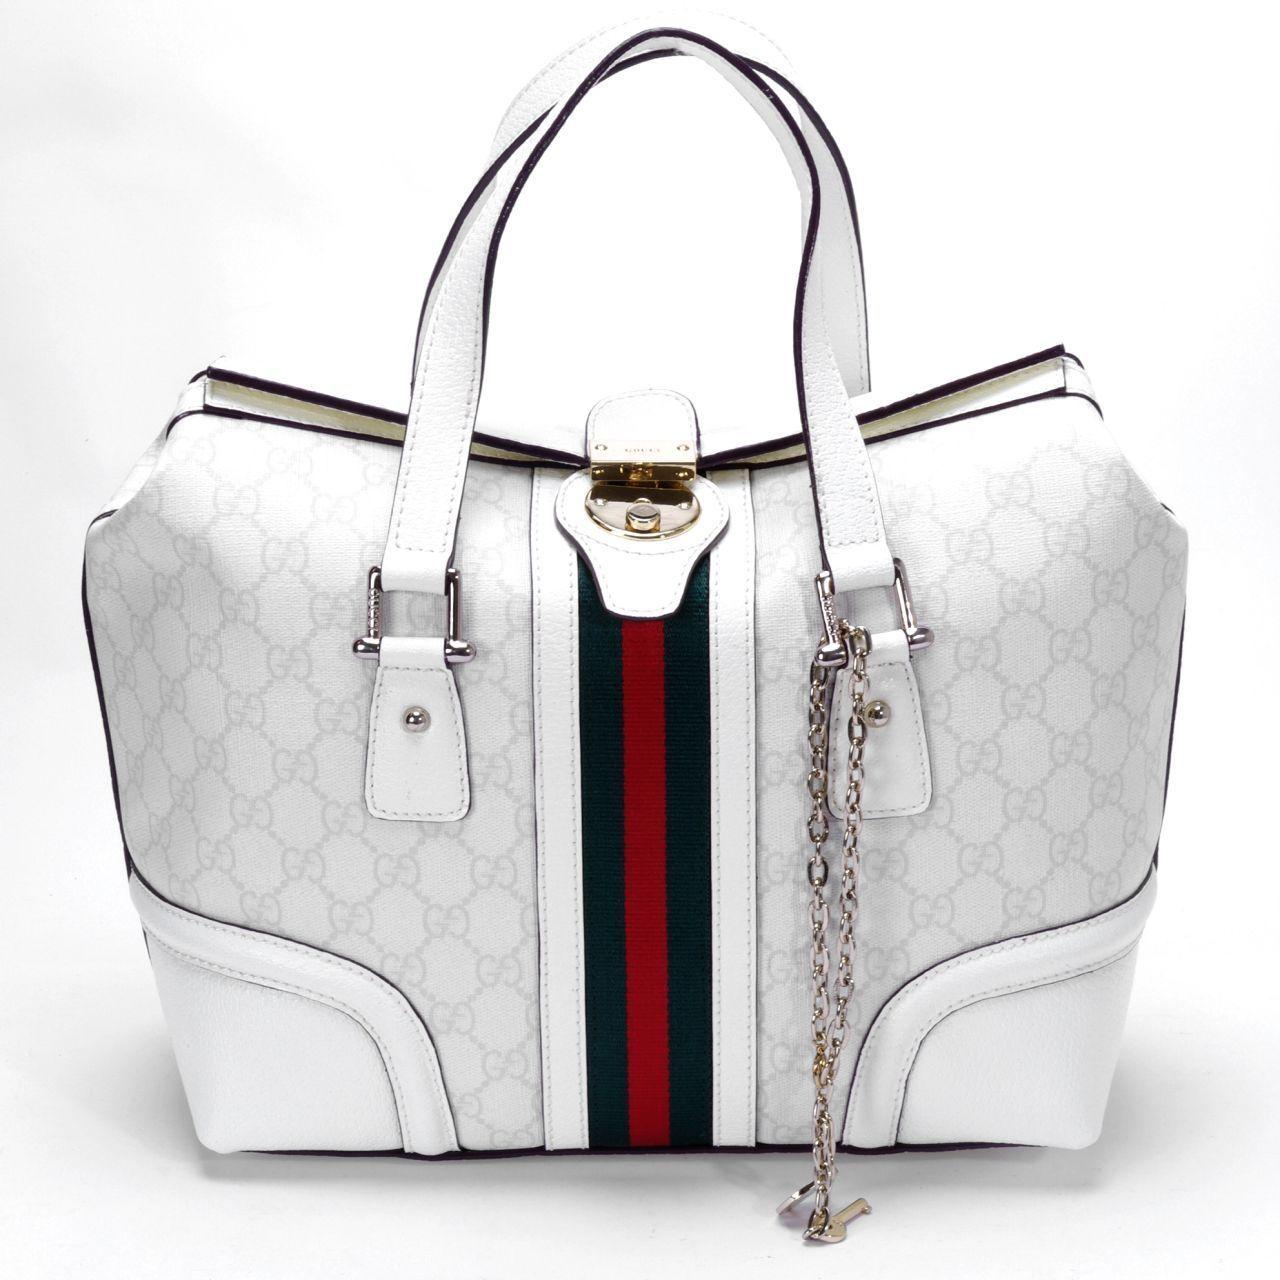 White Gucci Handbag Summerswag